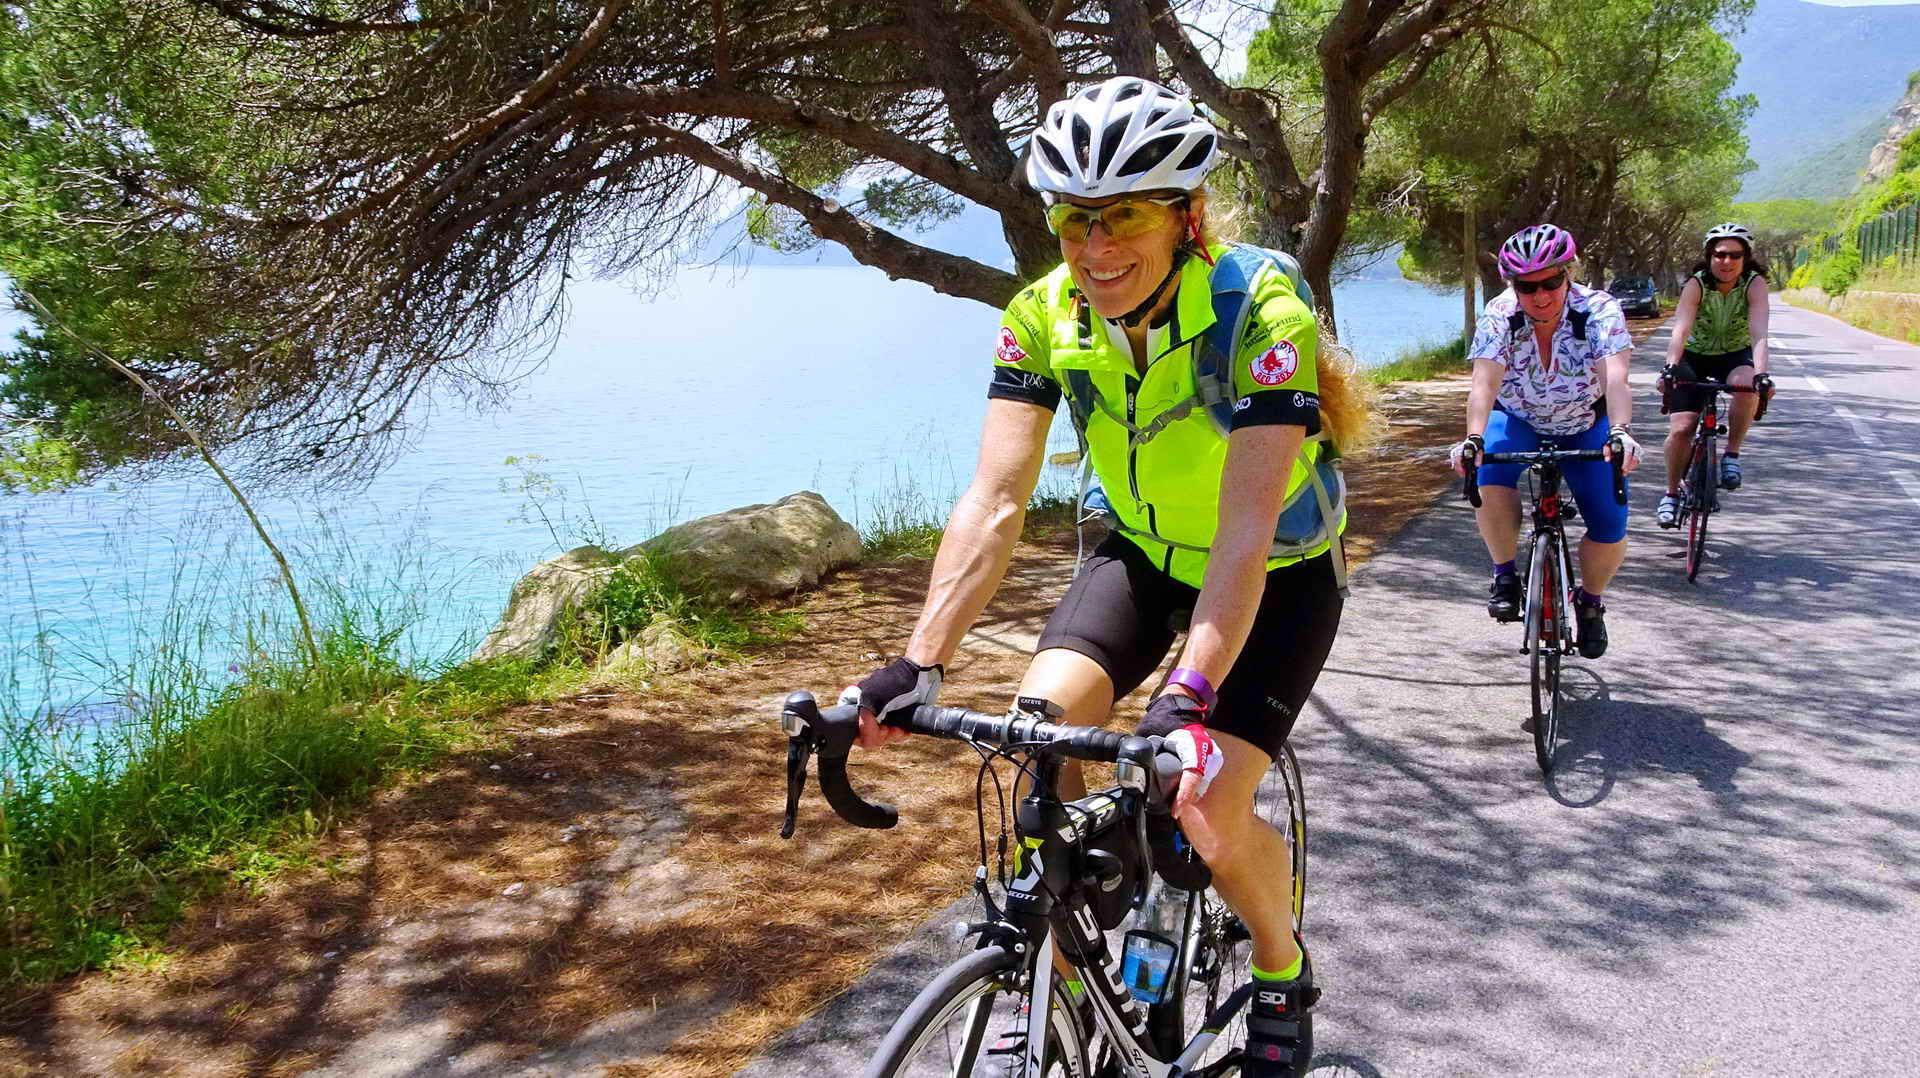 Bike Tours in Portugal, Algarve Bike Tour